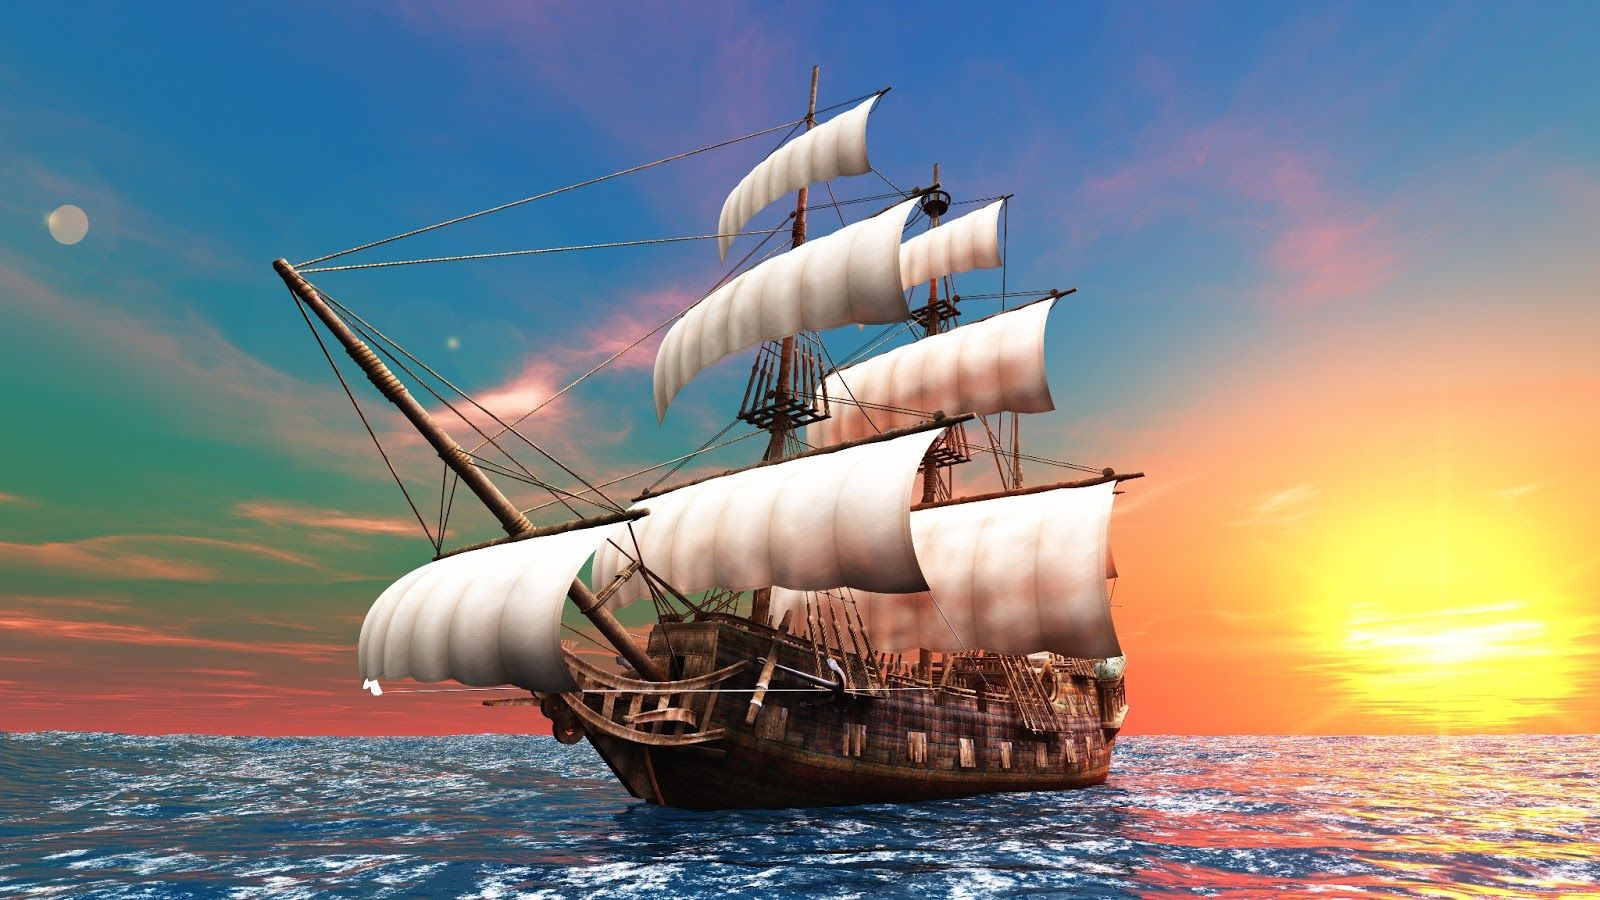 Sailing Wallpaper Hd Best Hd Wallpapers Sailboat Painting